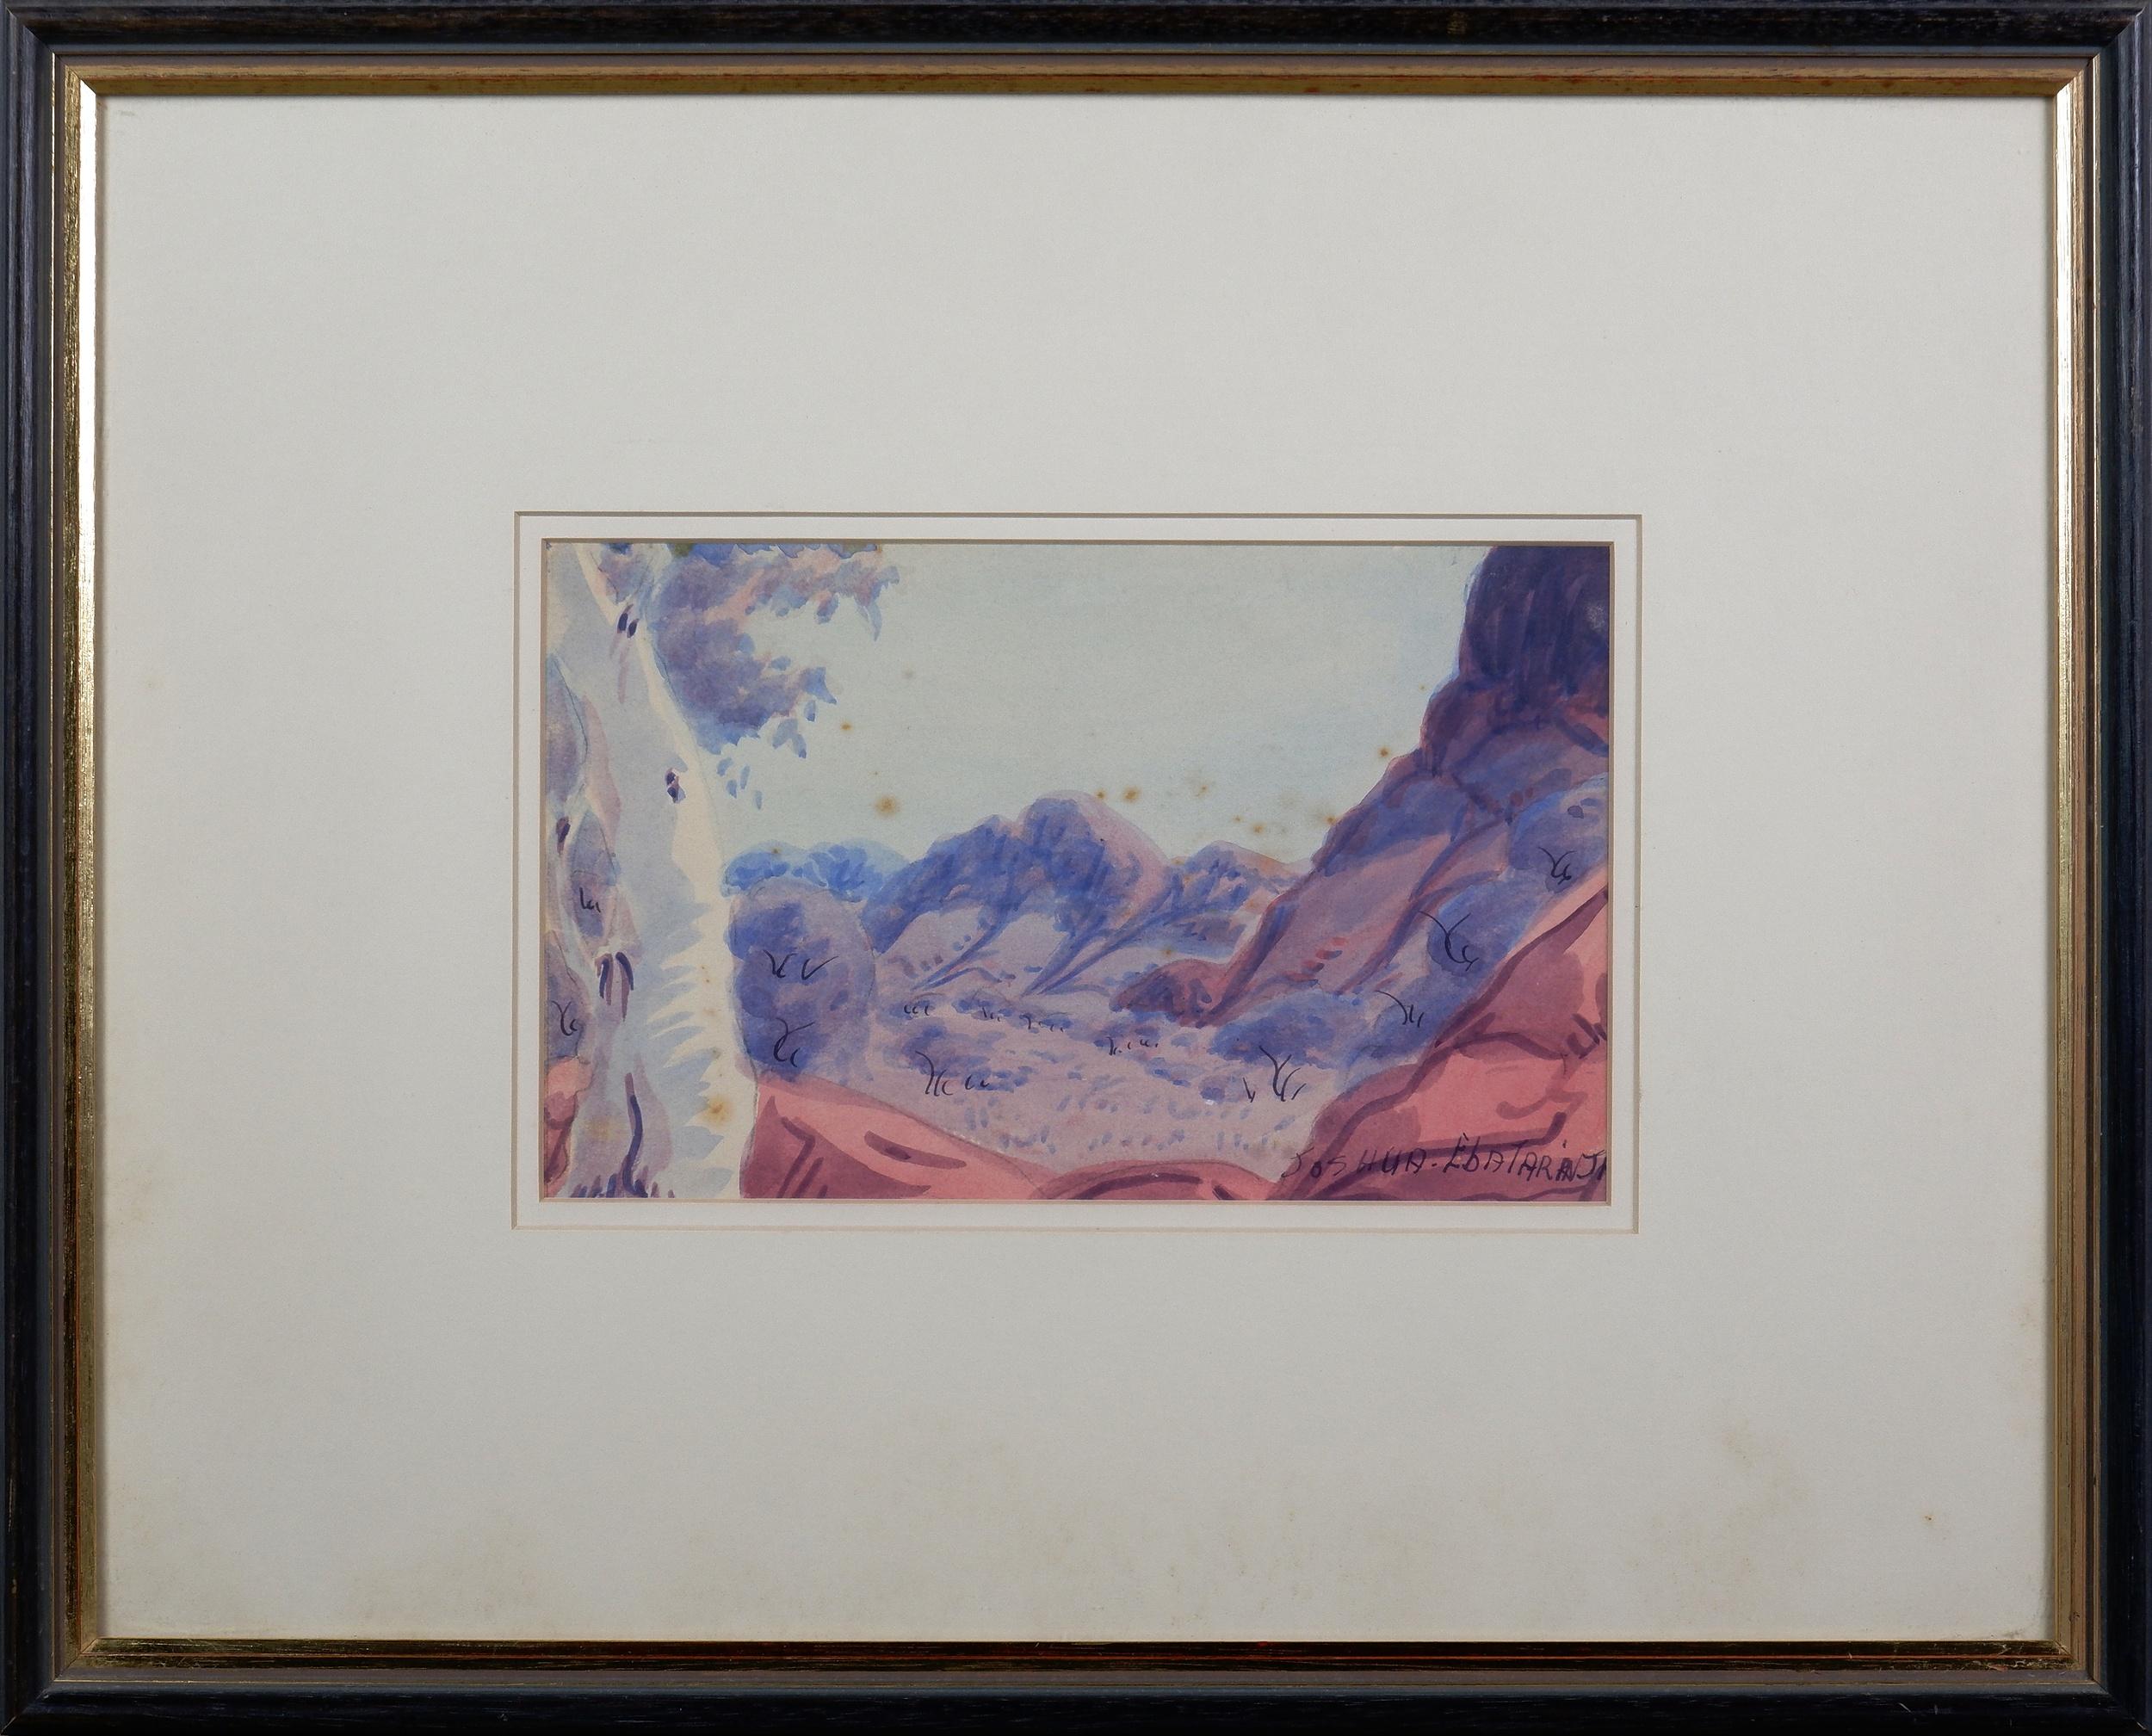 'Joshua Ebatarinja (1940-1973), Central Australian Landscape, Watercolour, 15.5 x 25 cm'